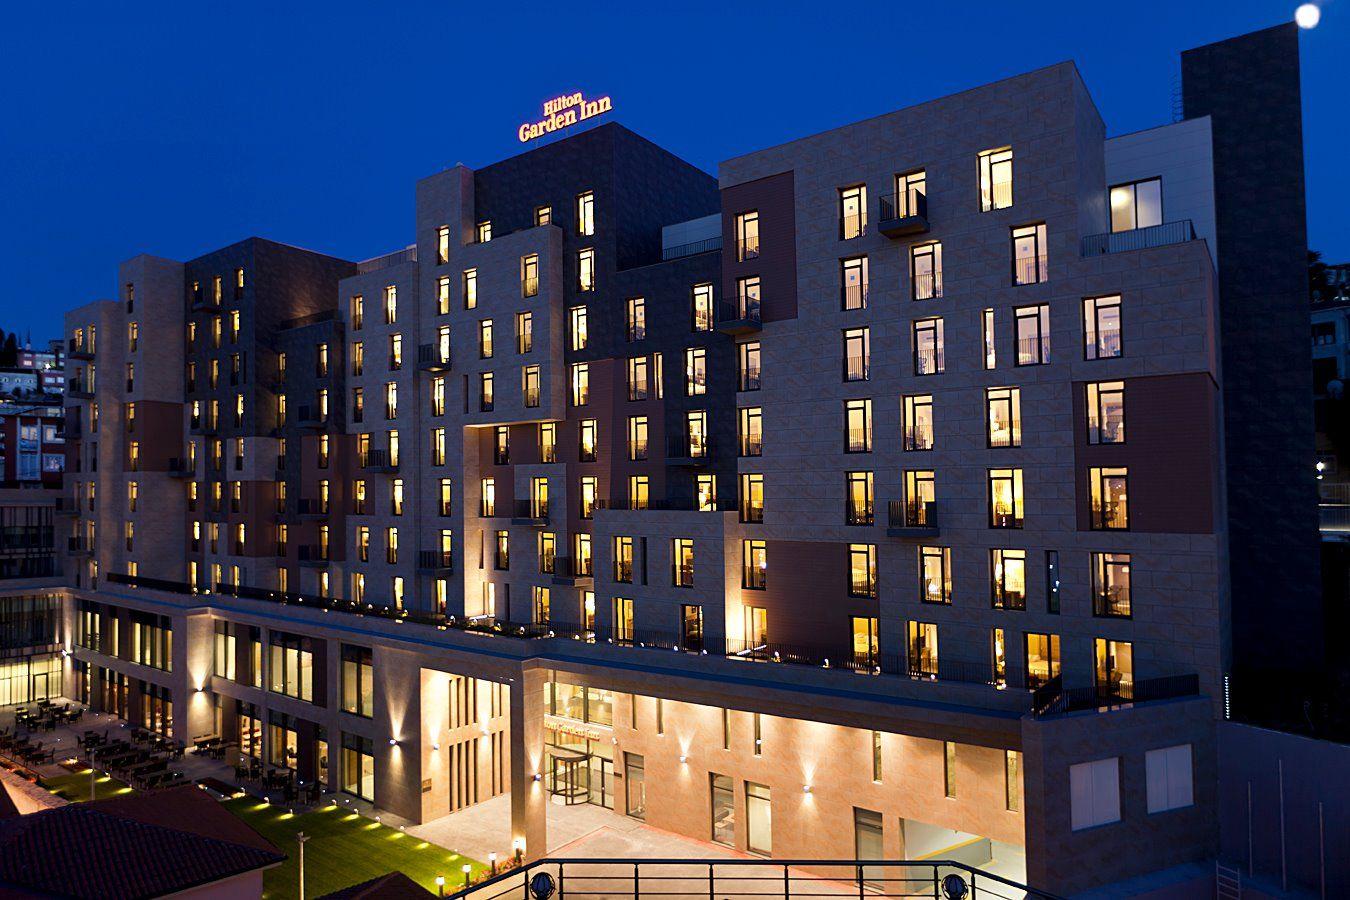 Welcome To Hilton Garden Inn Istanbul Golden Horn Turkey Located